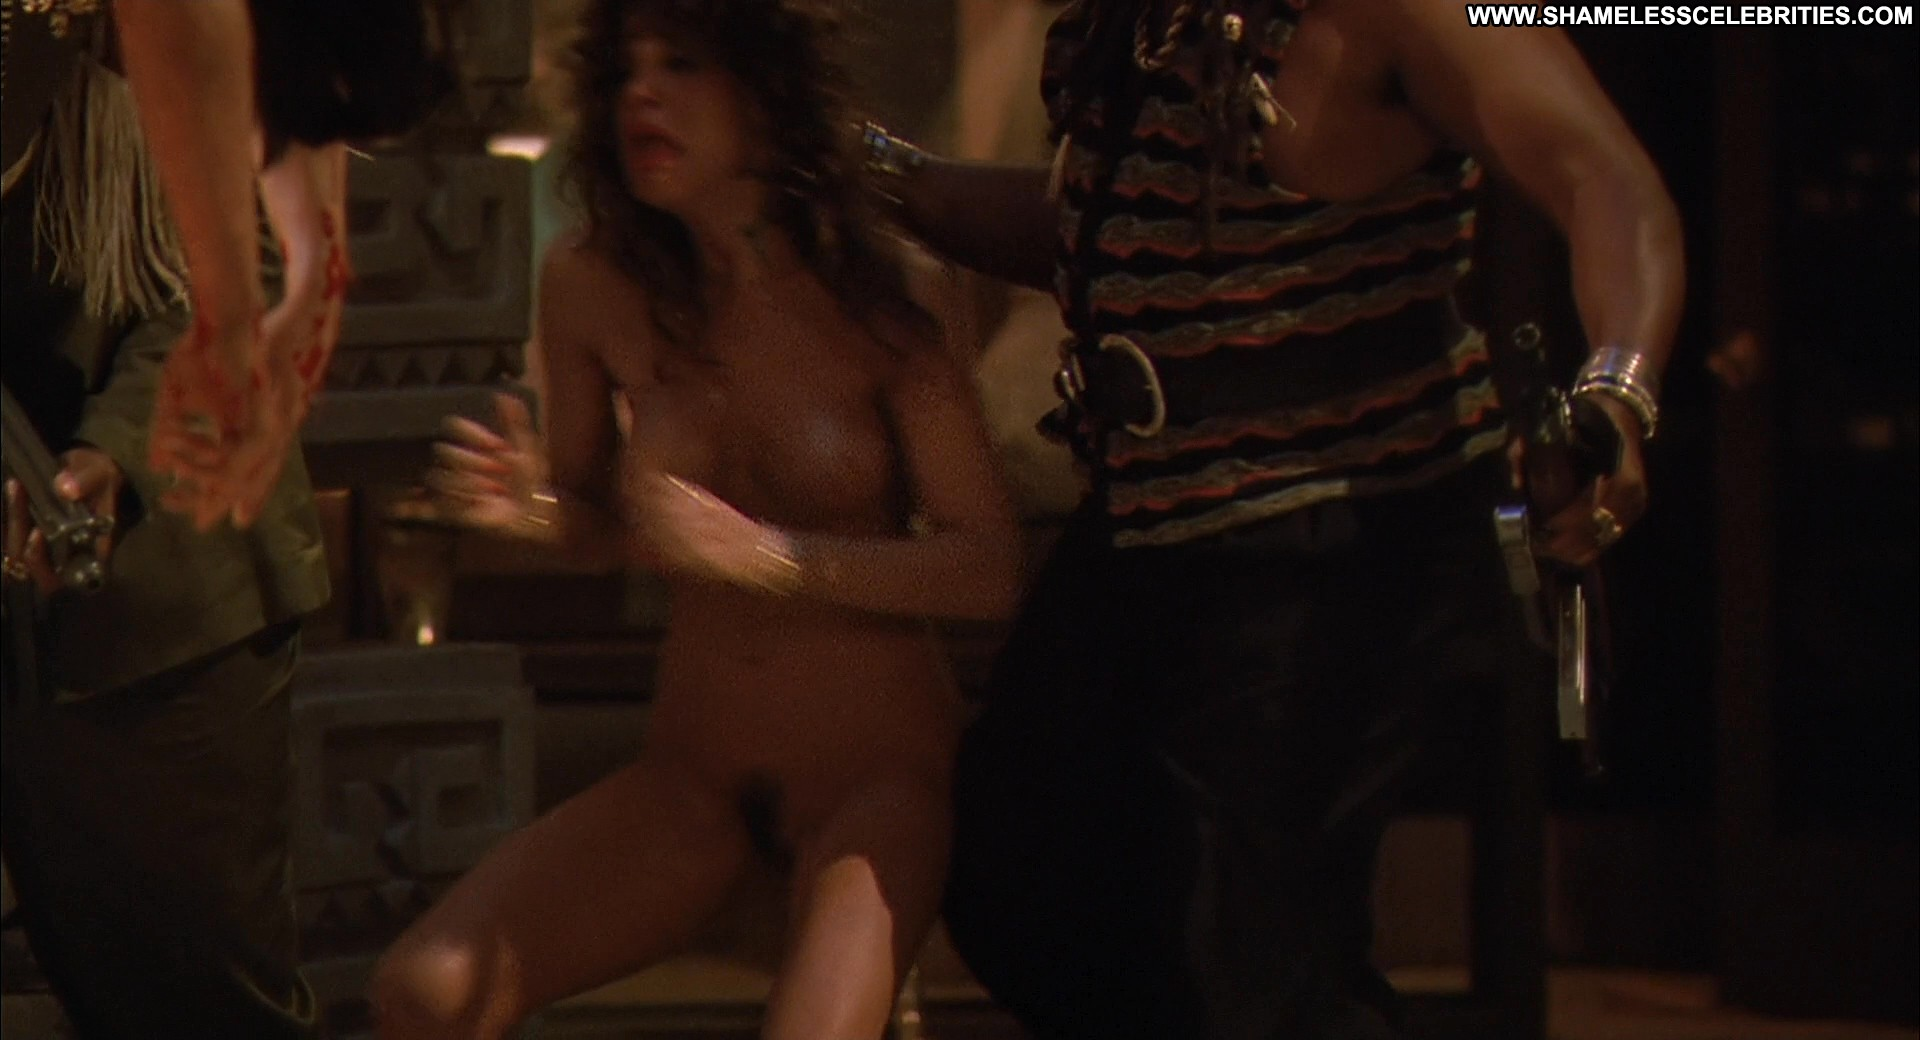 nymphomaniac sex scene